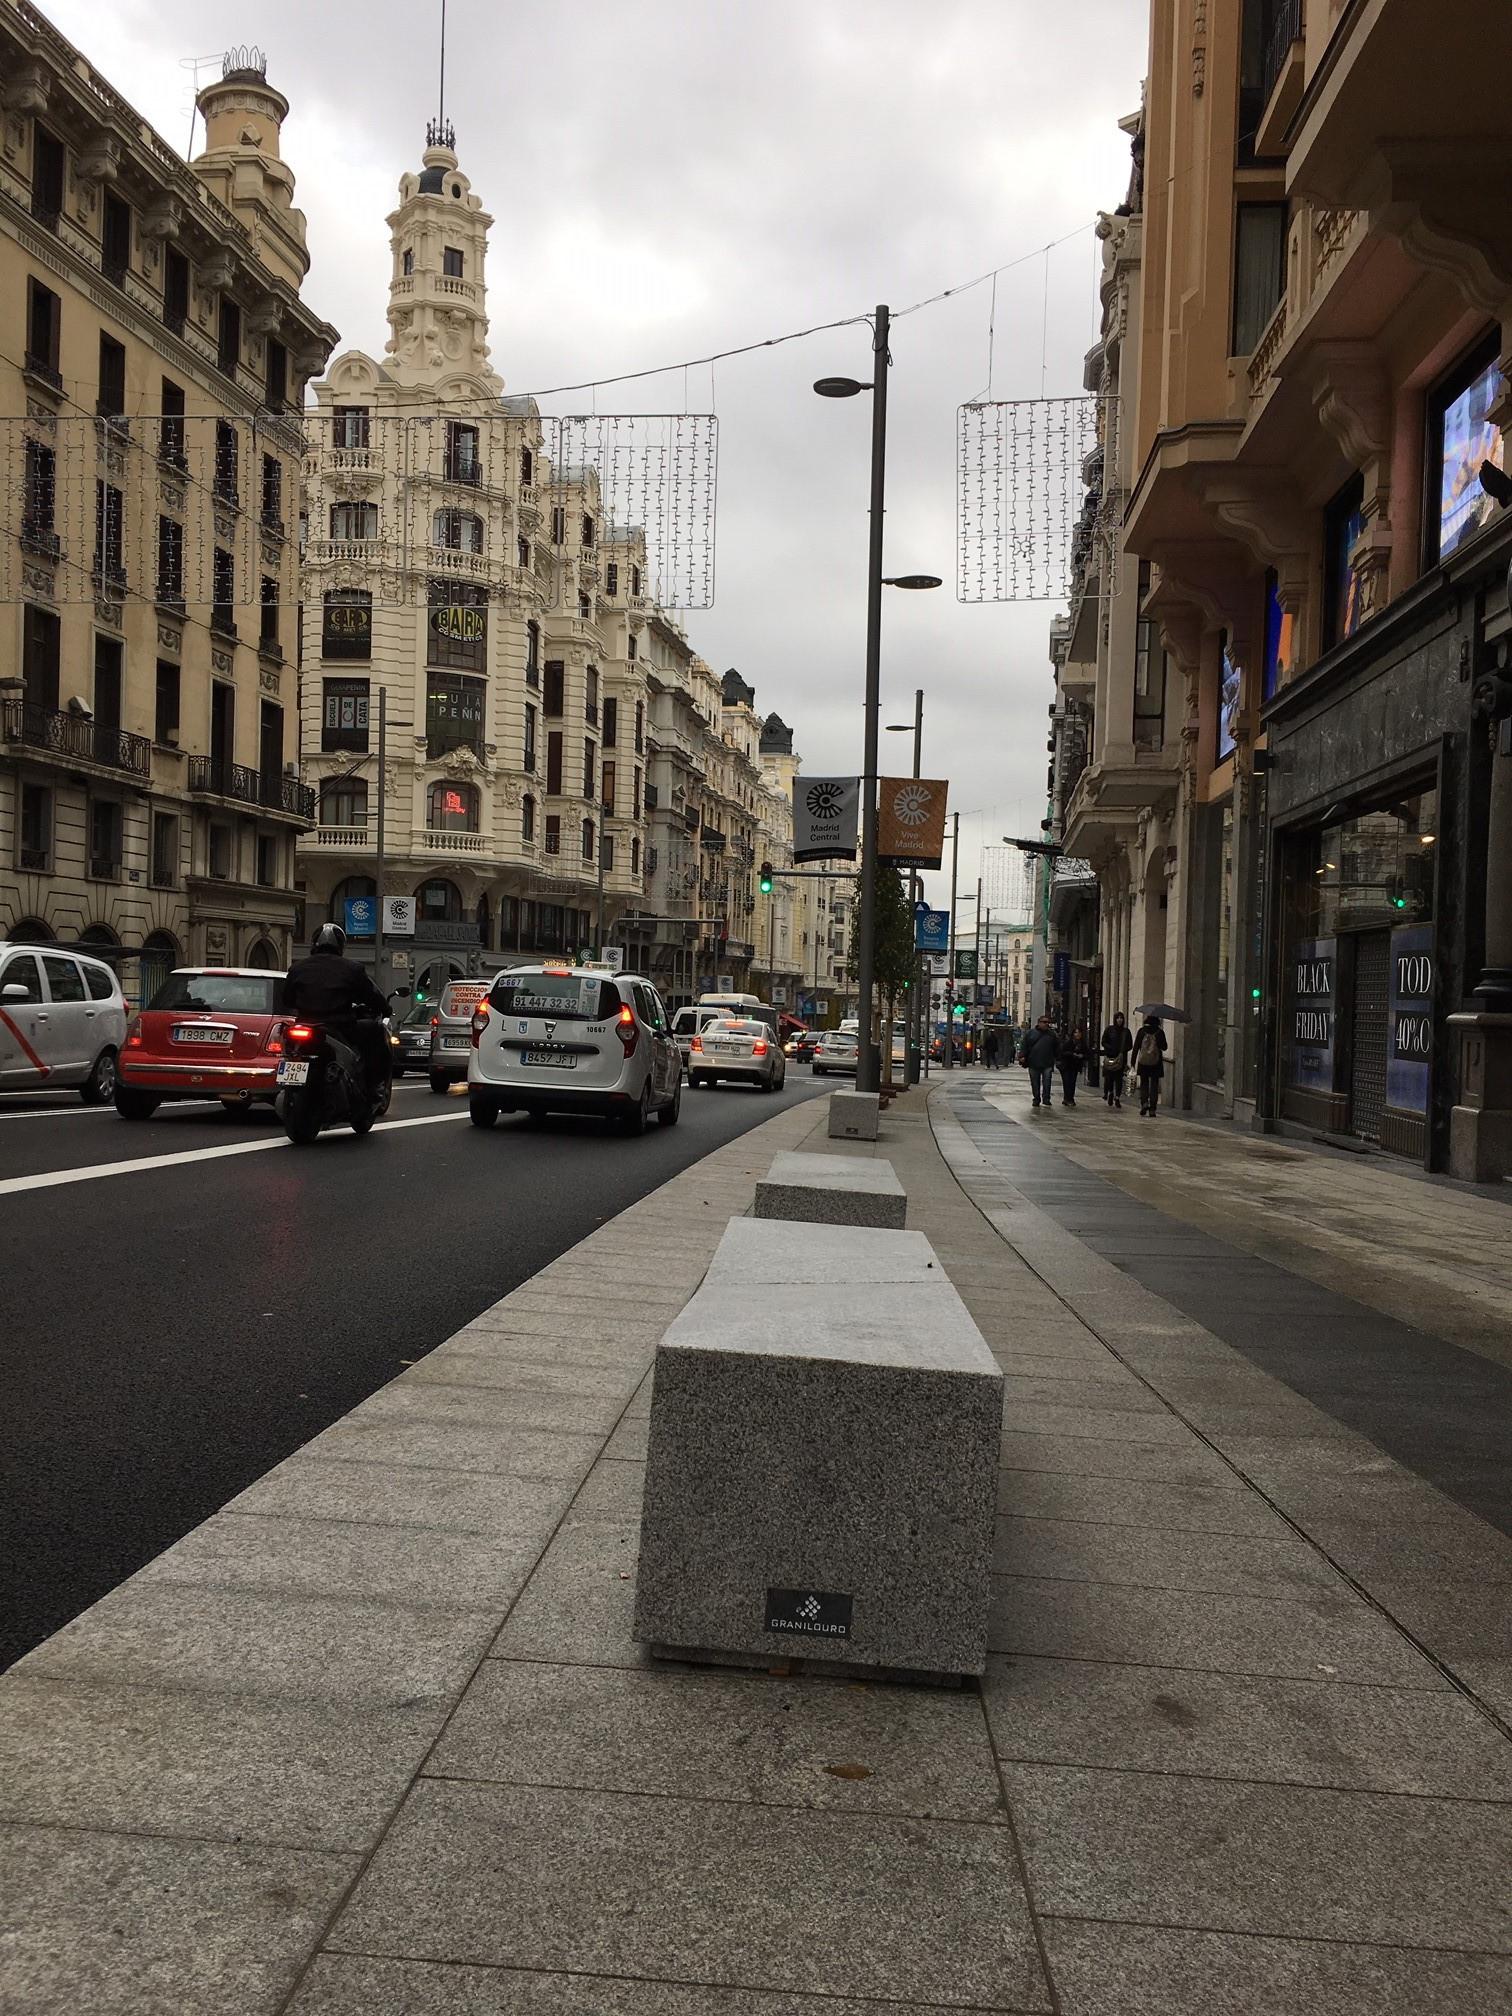 Gran_Vía_Madrid_granito_pavimento_bancos